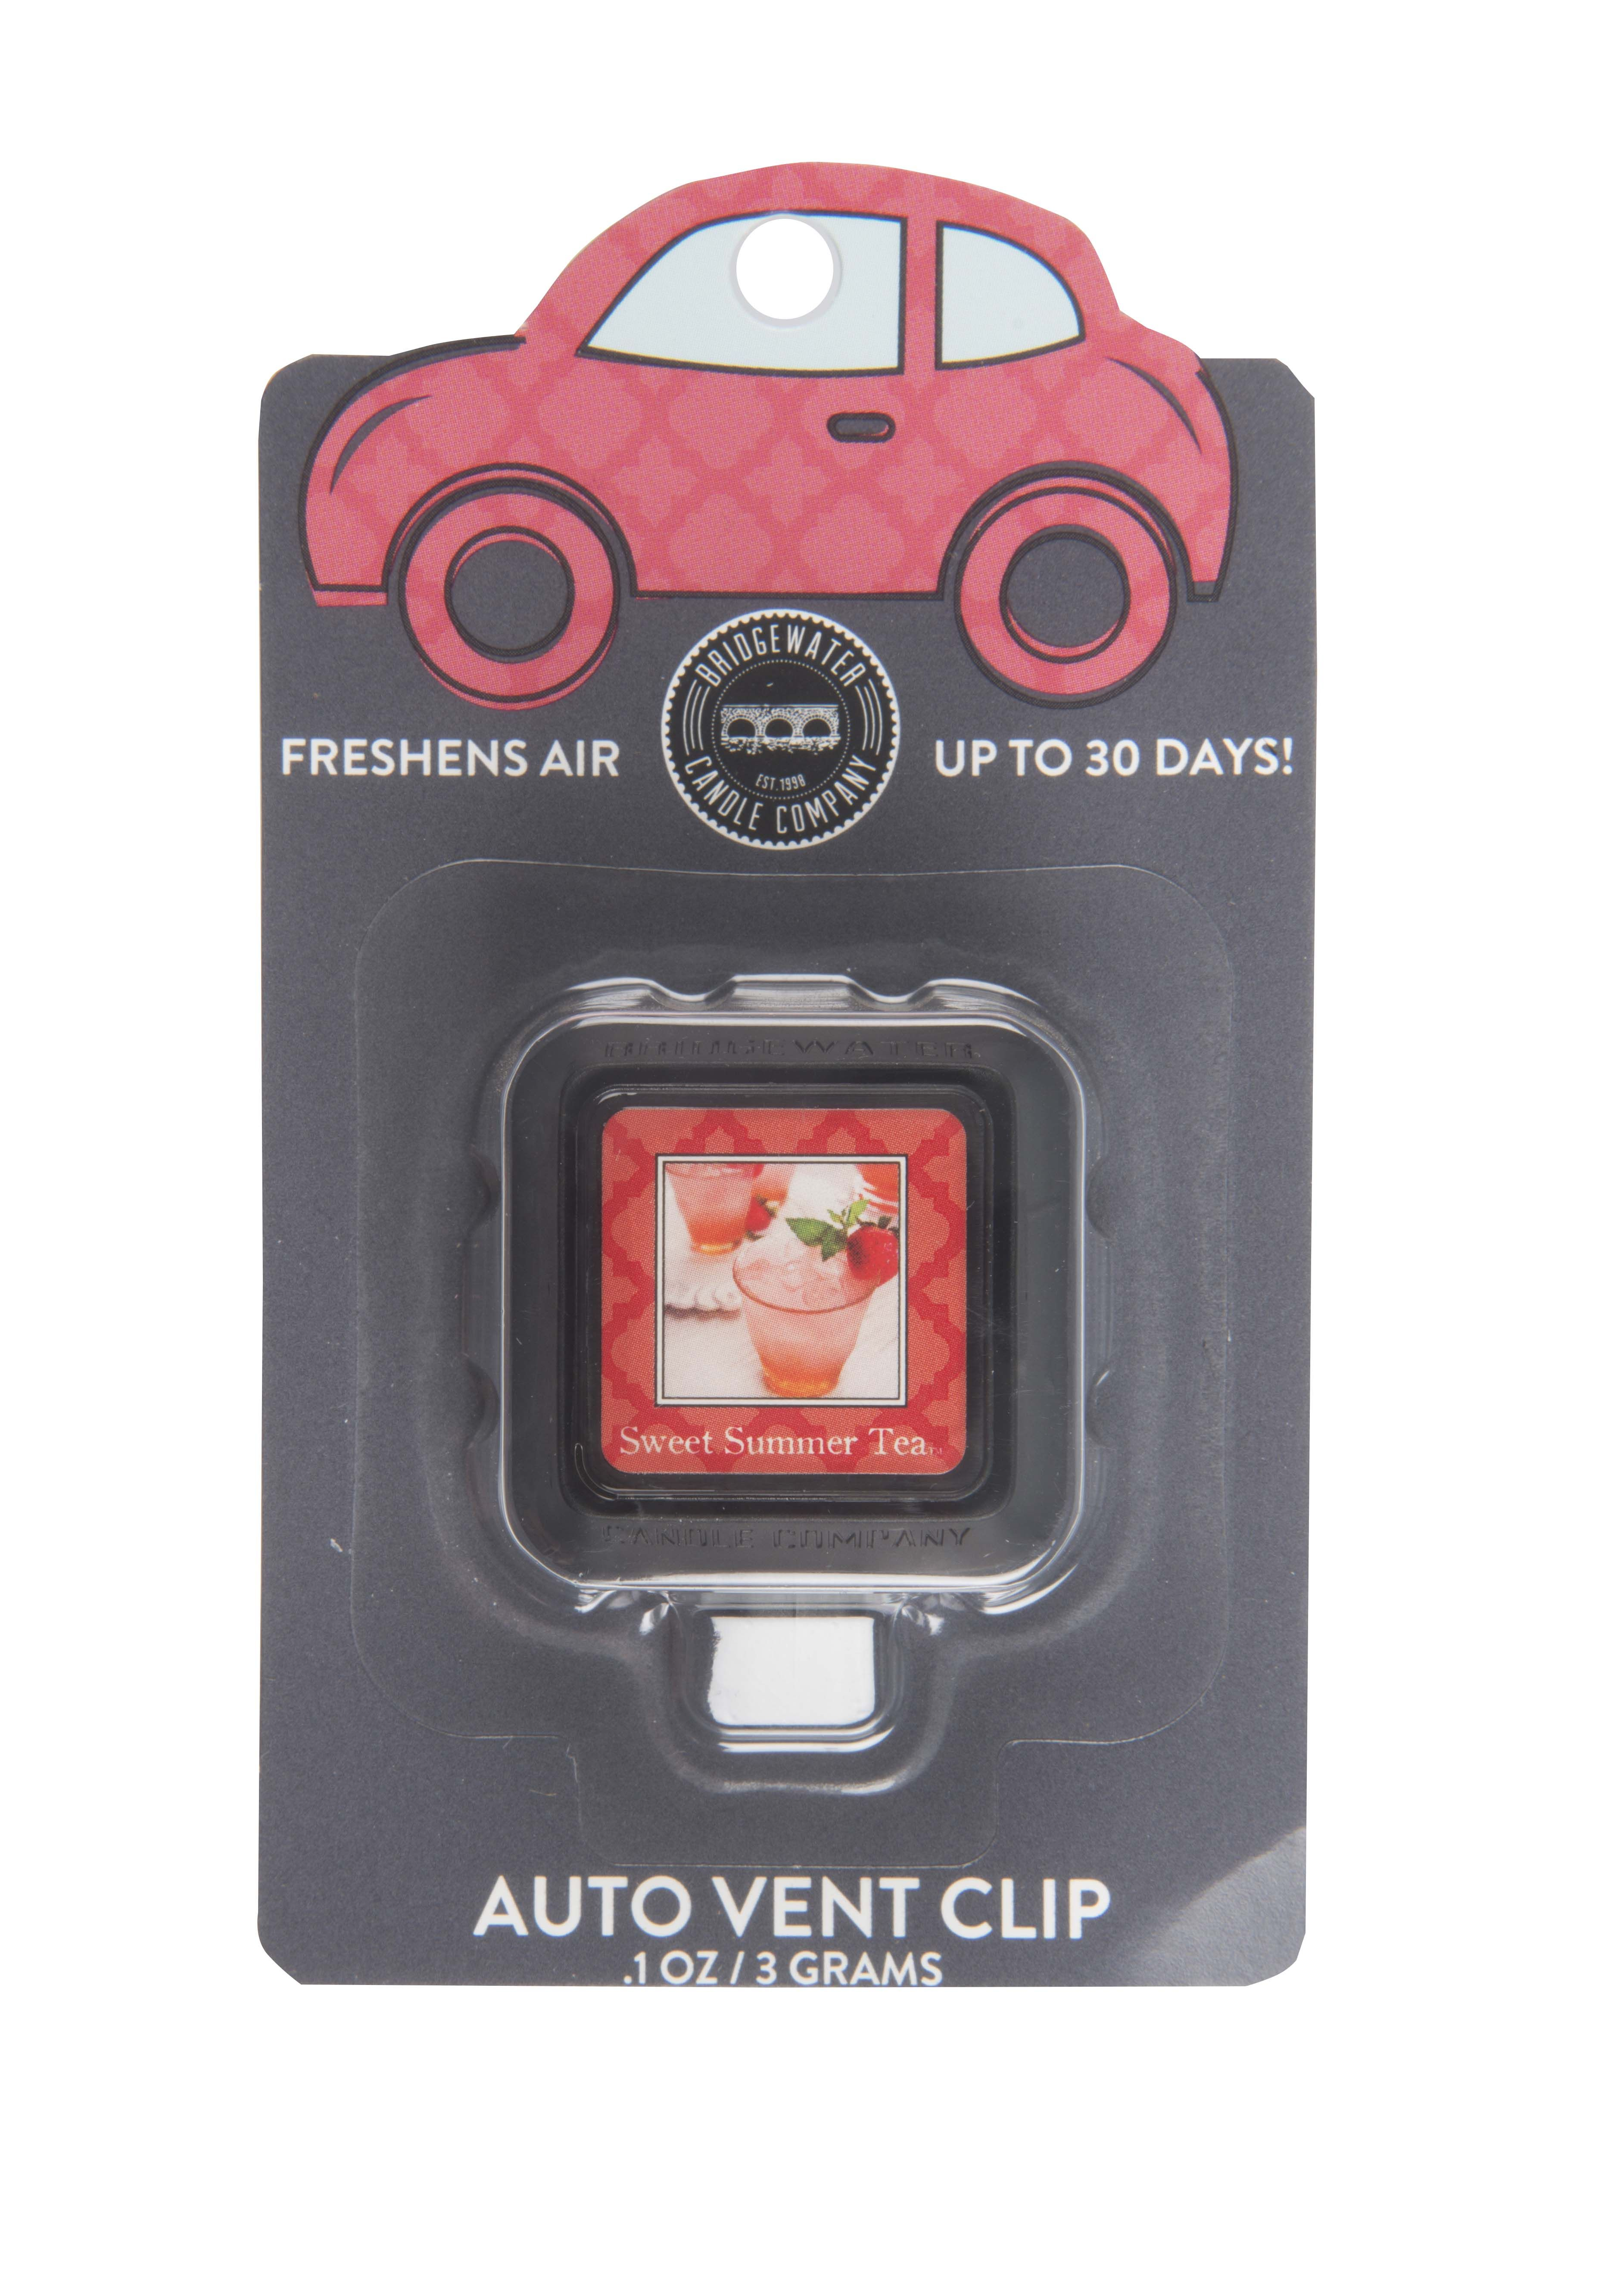 Sweet Summer Tea Car Freshener Innovative technology